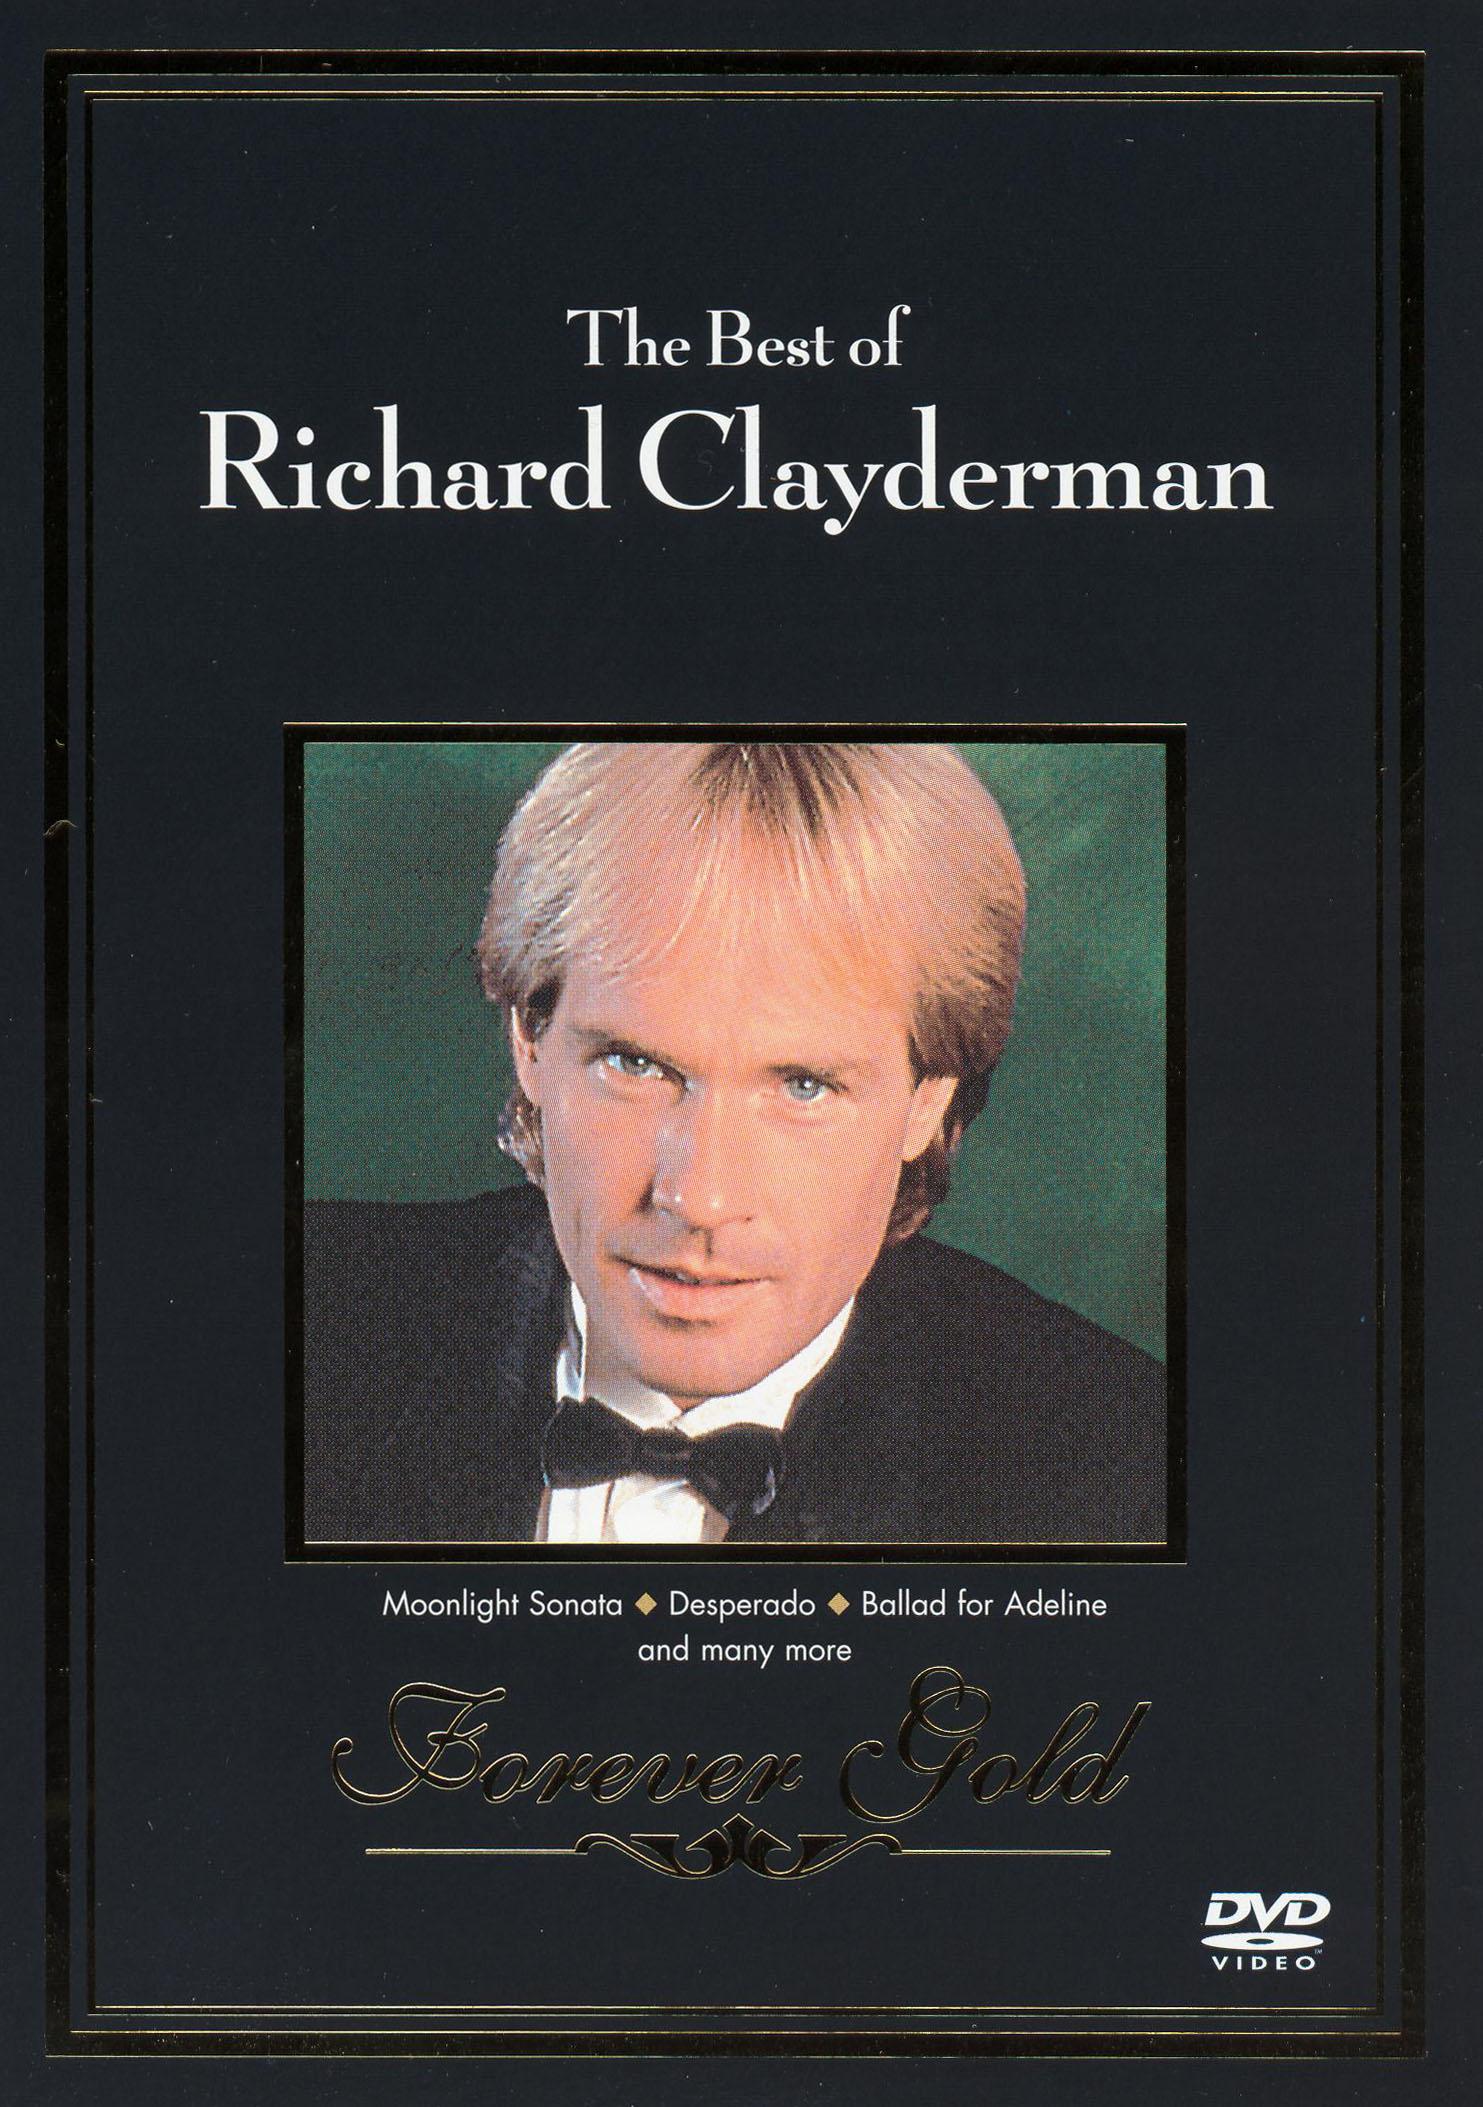 Richard Clayderman: The Best of Richard Clayderman - Forever Gold